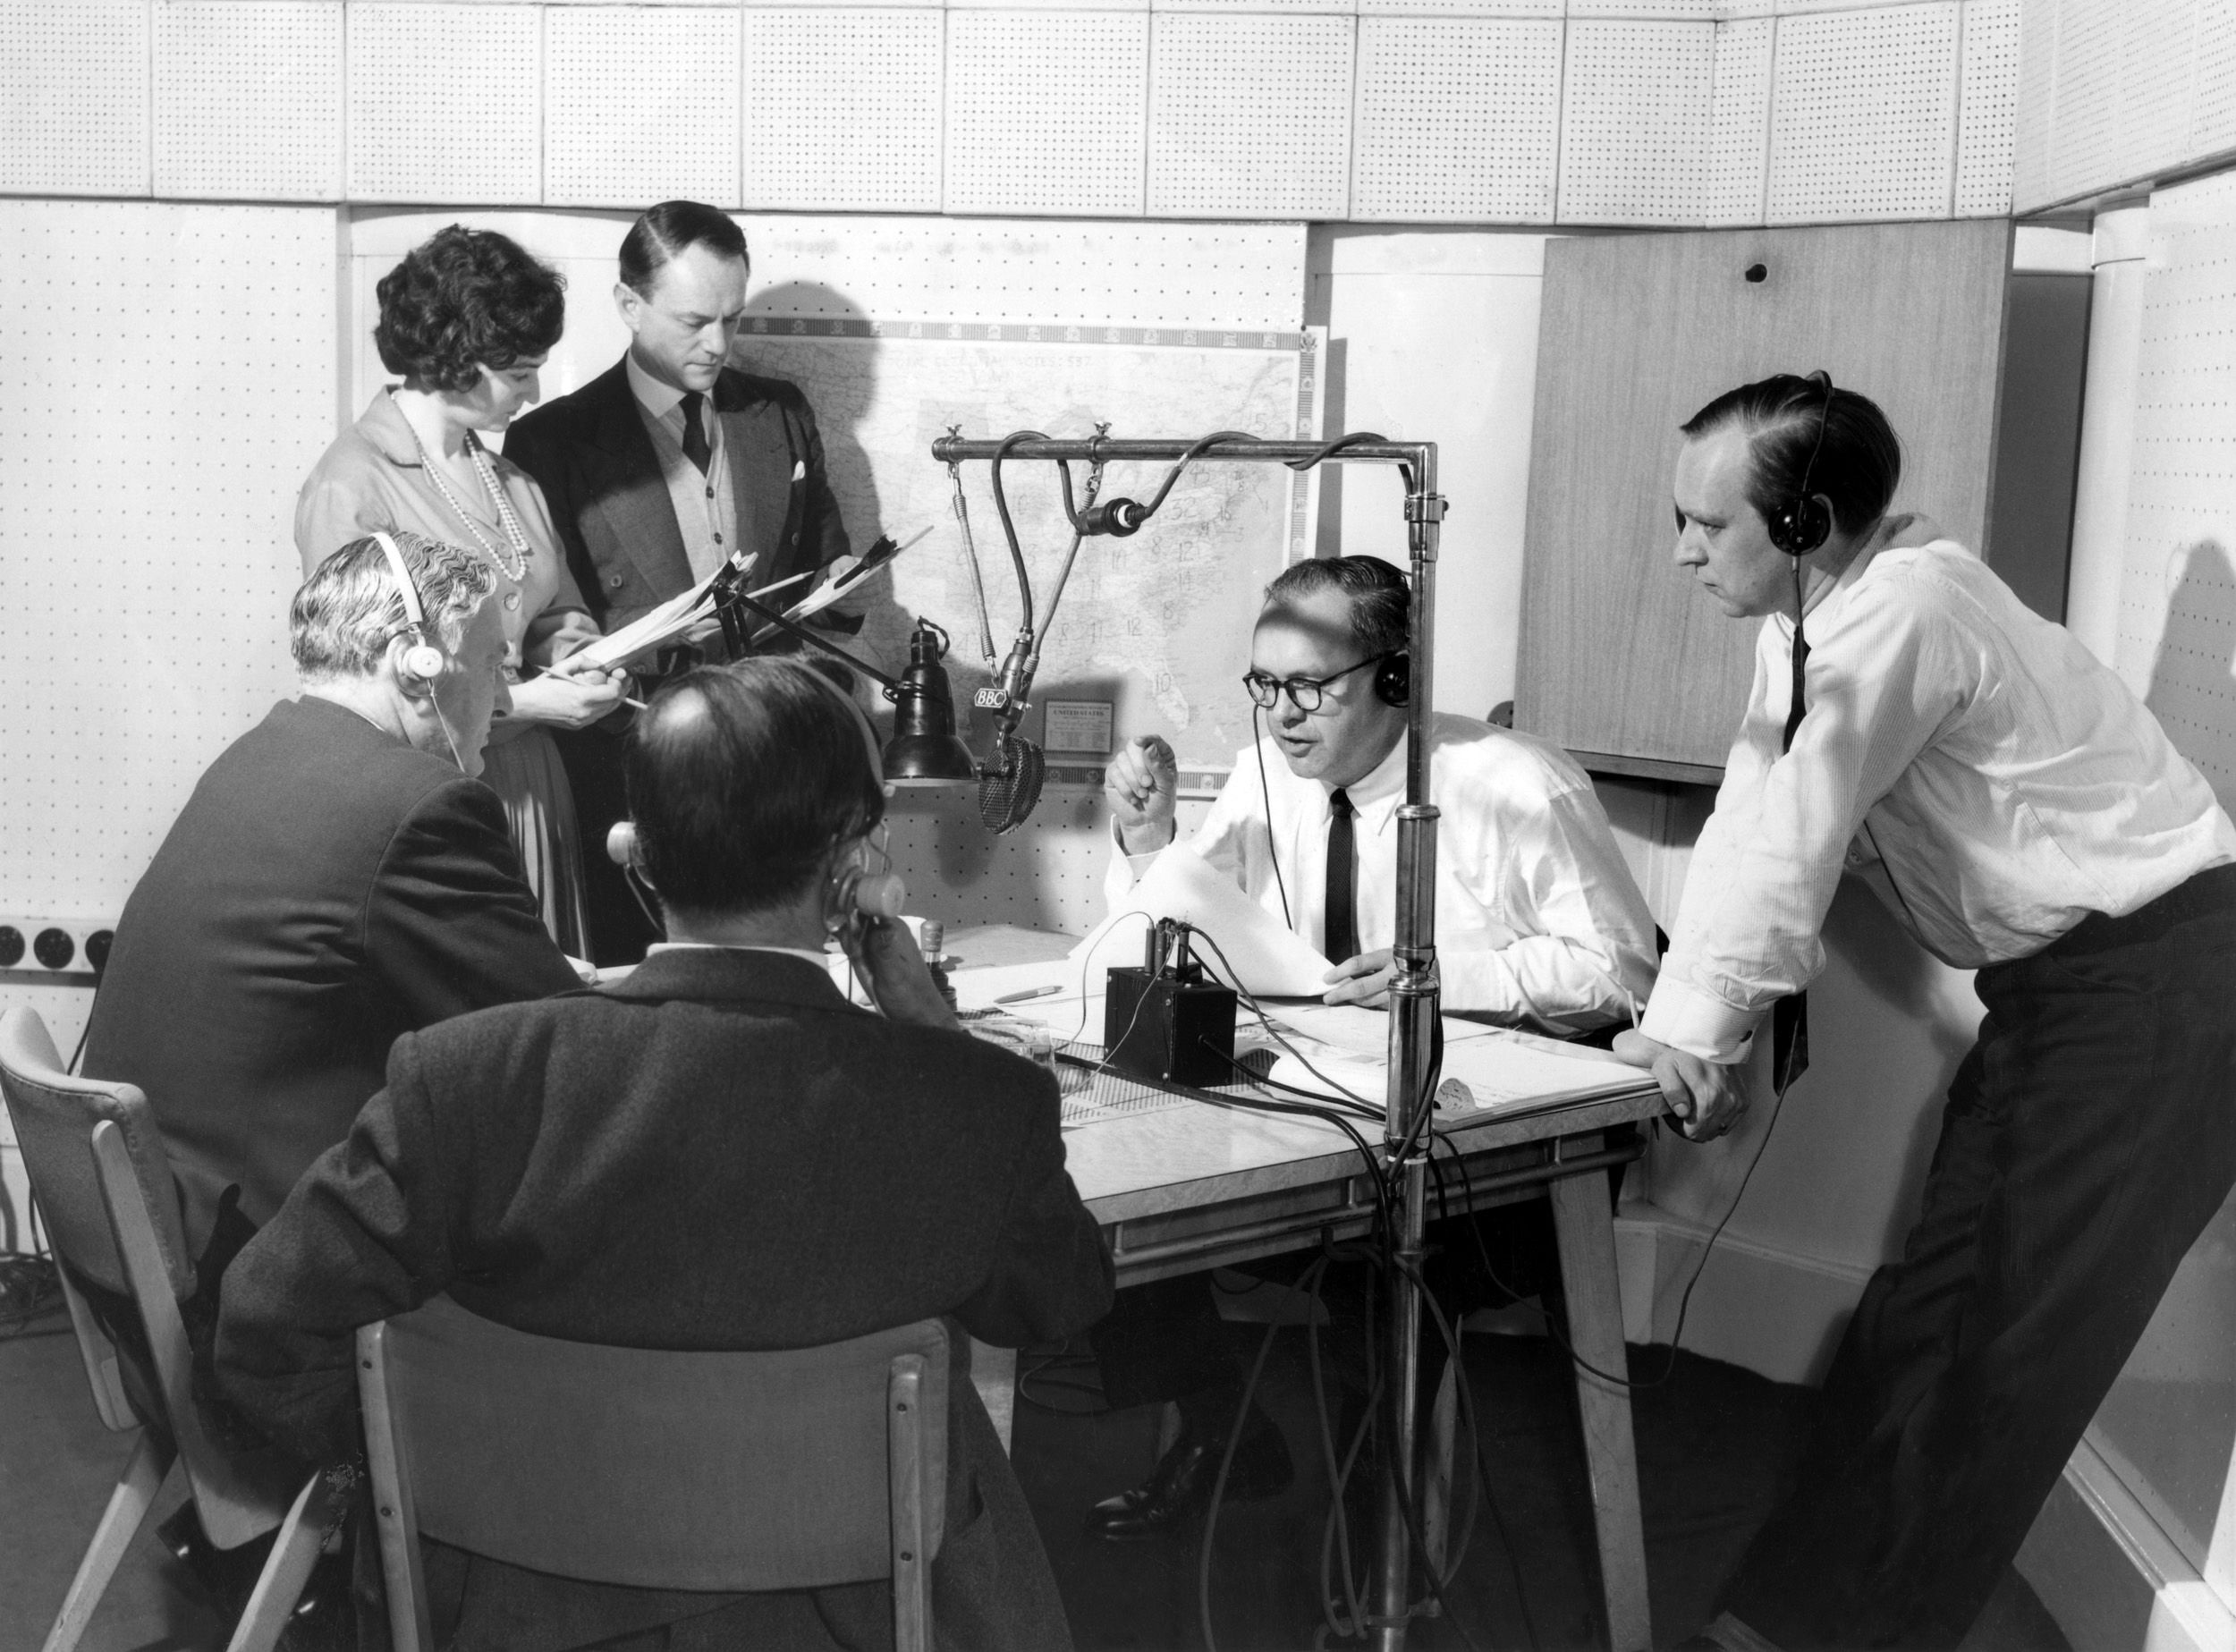 1960s news team. Scenes, Behind the scenes, Scene